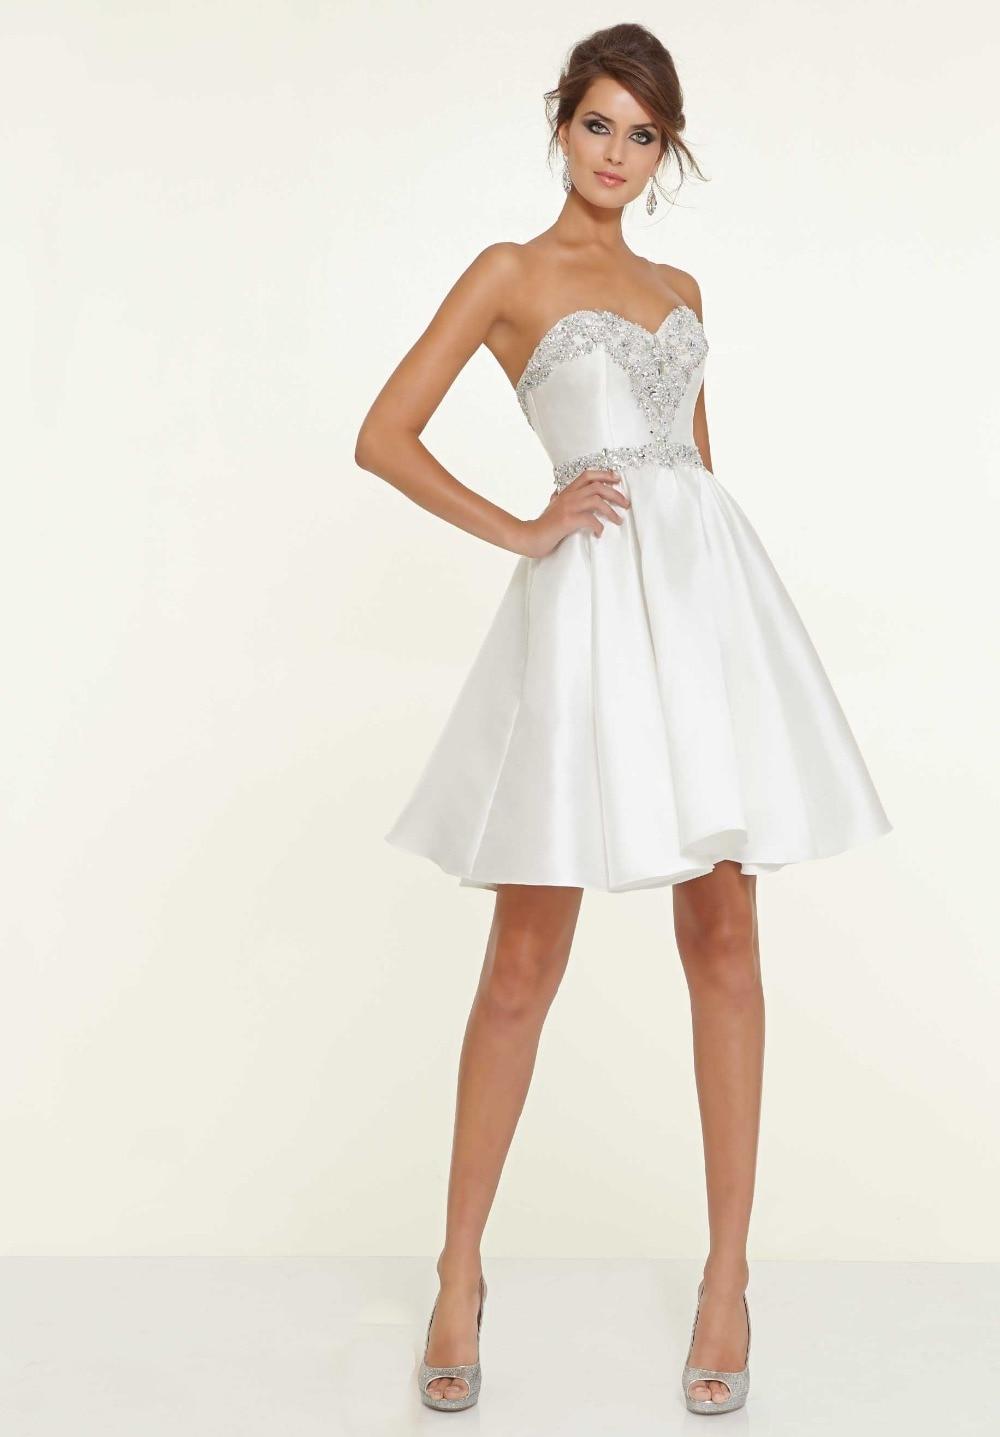 High Quality Short White Prom Dresses-Buy Cheap Short White Prom ...